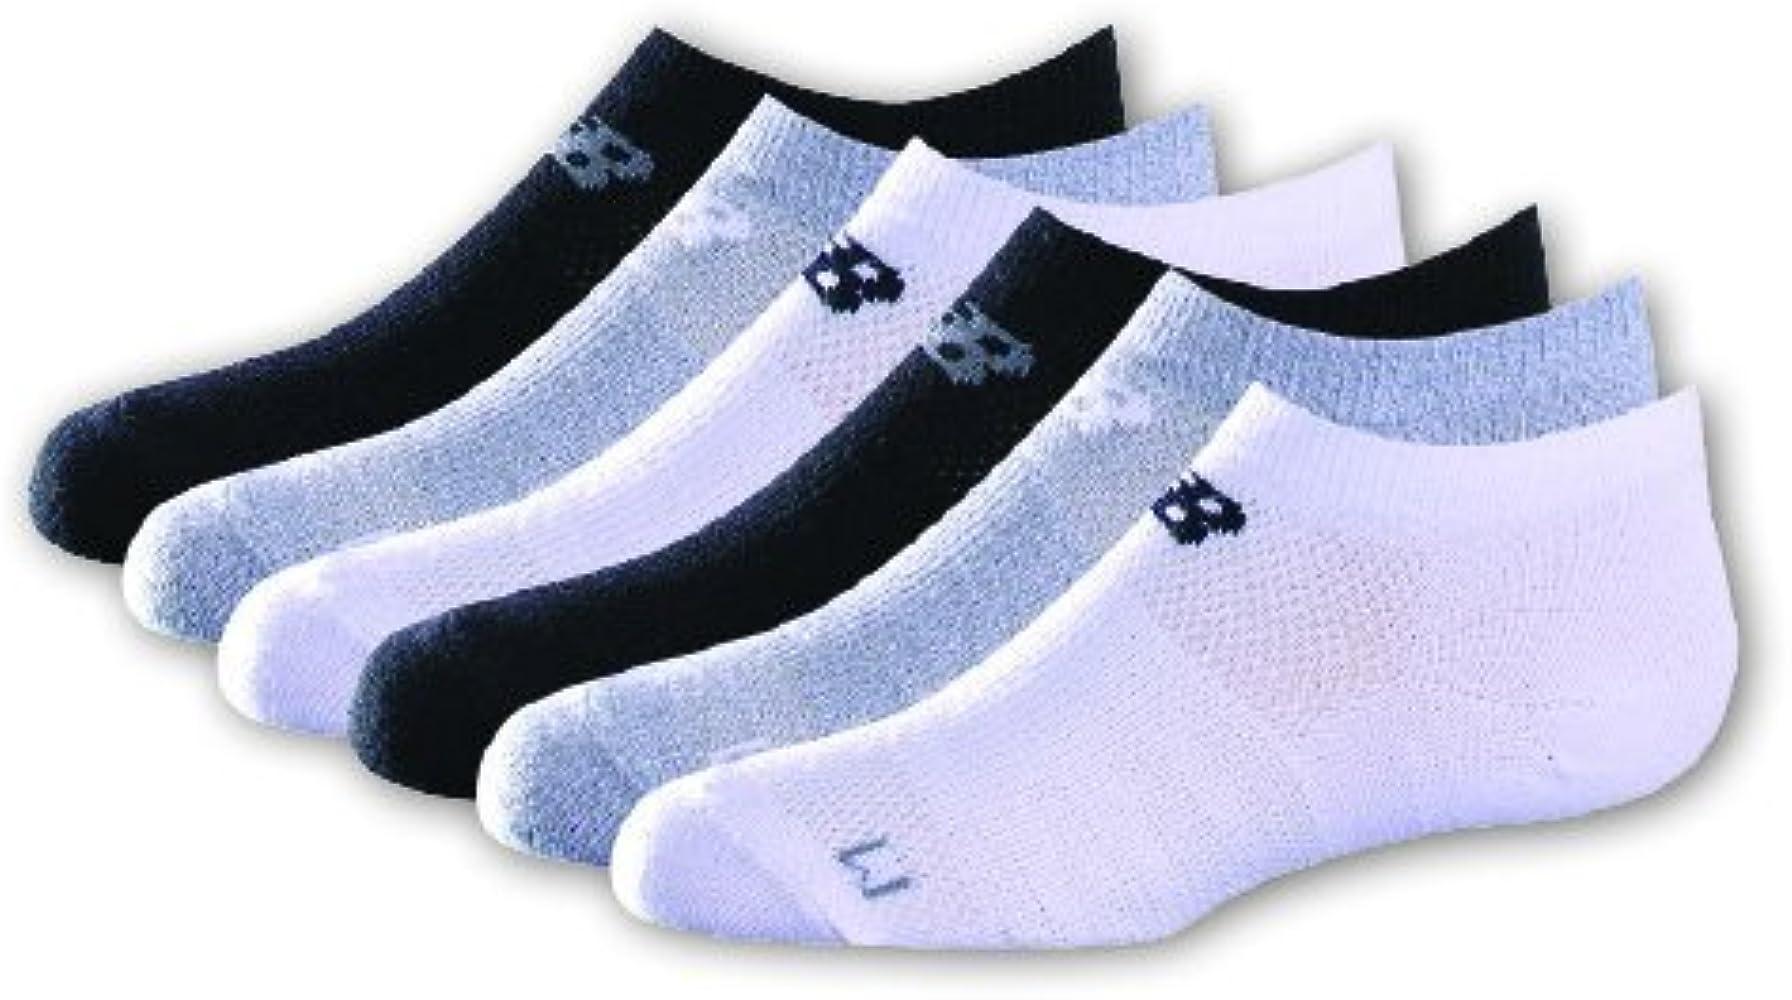 acb2be76424d1 Amazon.com: New Balance Kids Unisex 6 Pack No Show Socks: Clothing